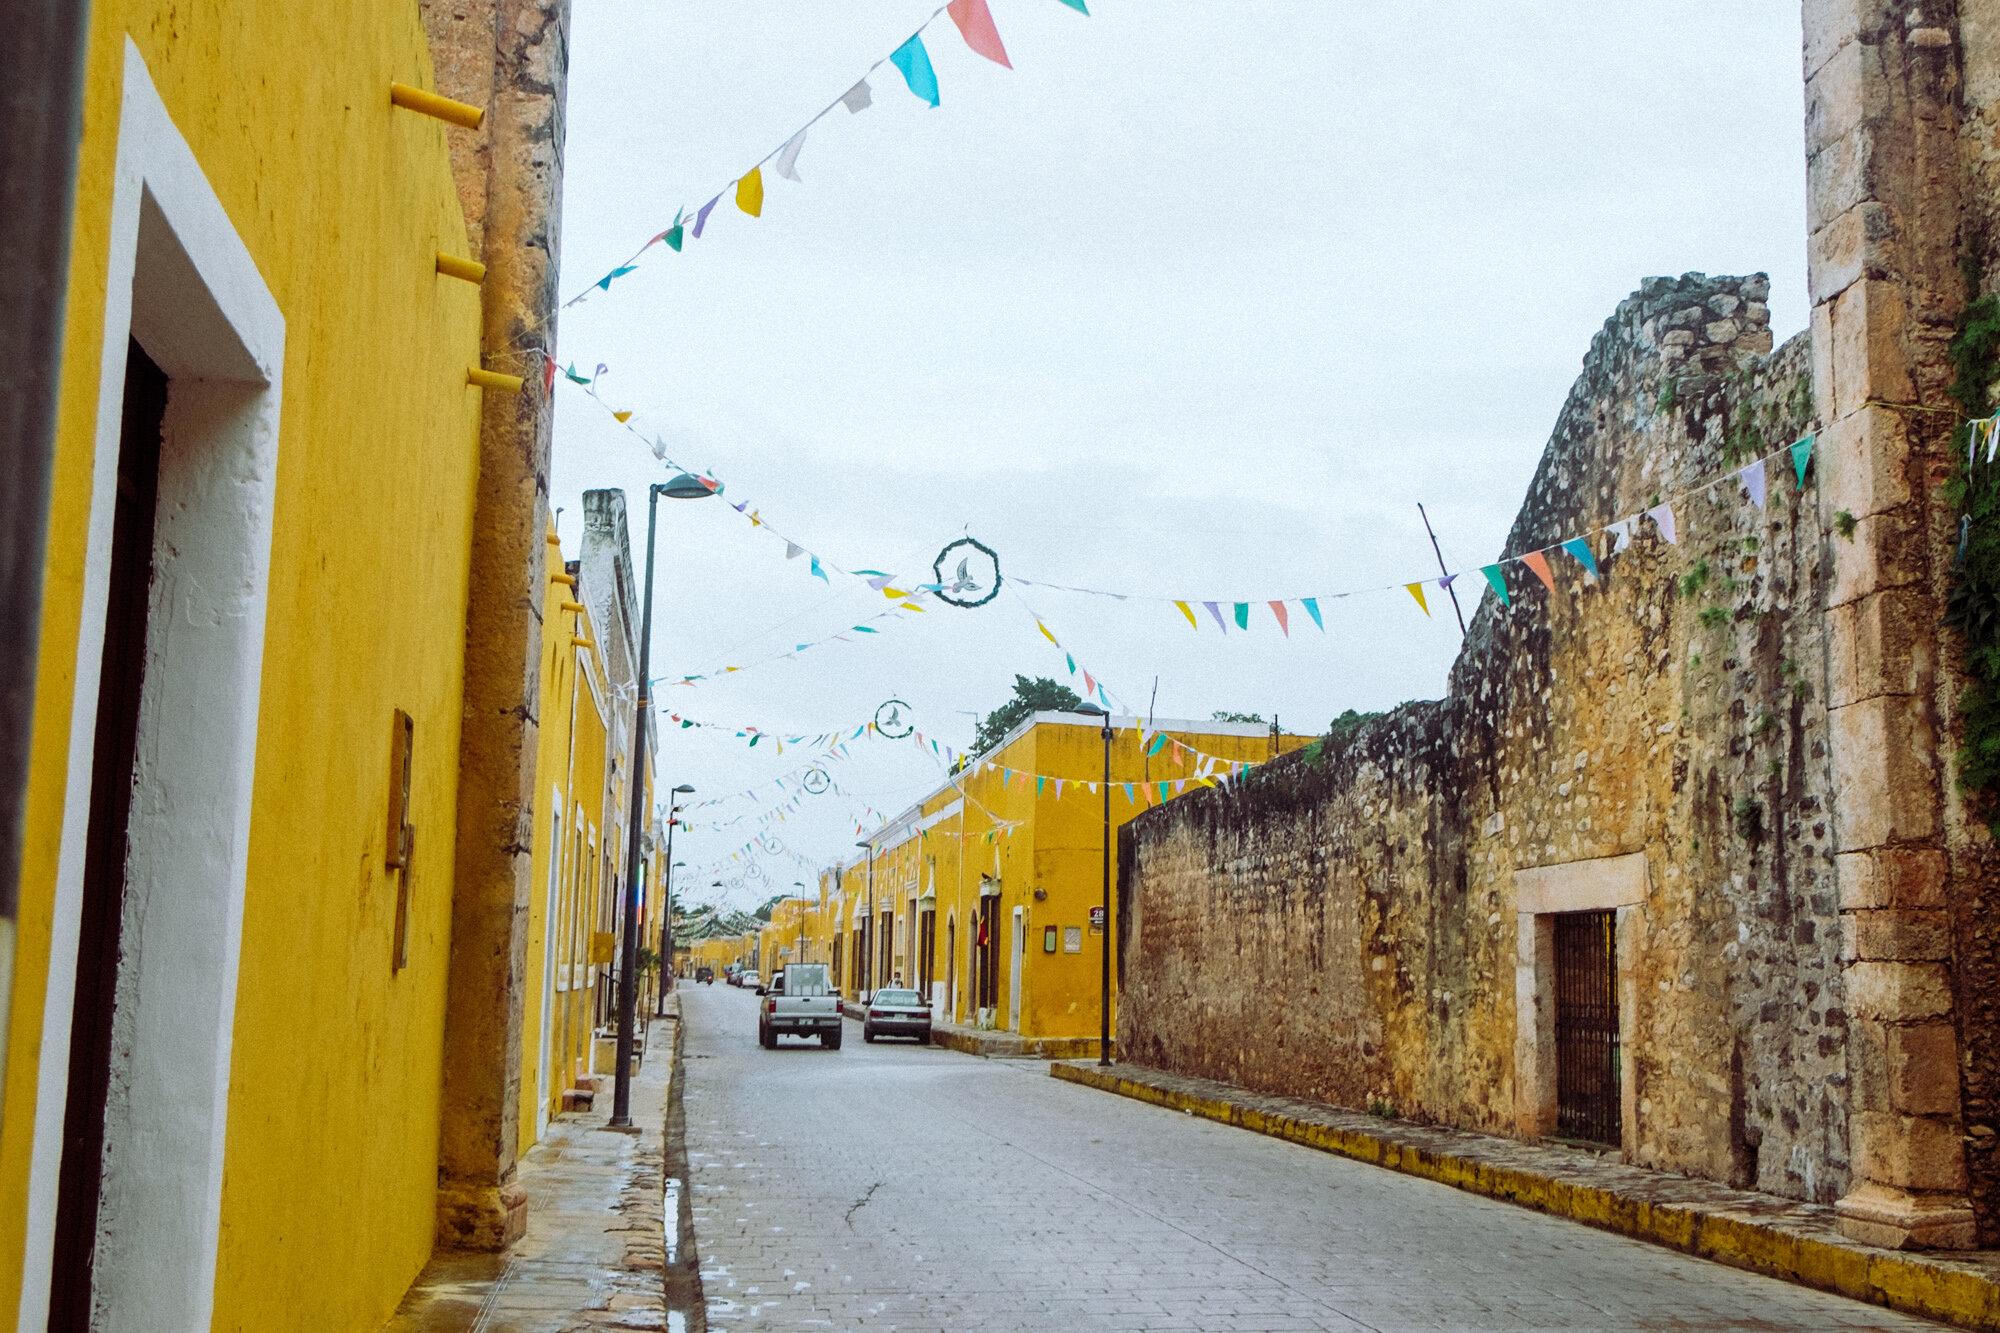 Rachel Off Duty: The Yellow, Cobblestoned Streets of Izamal